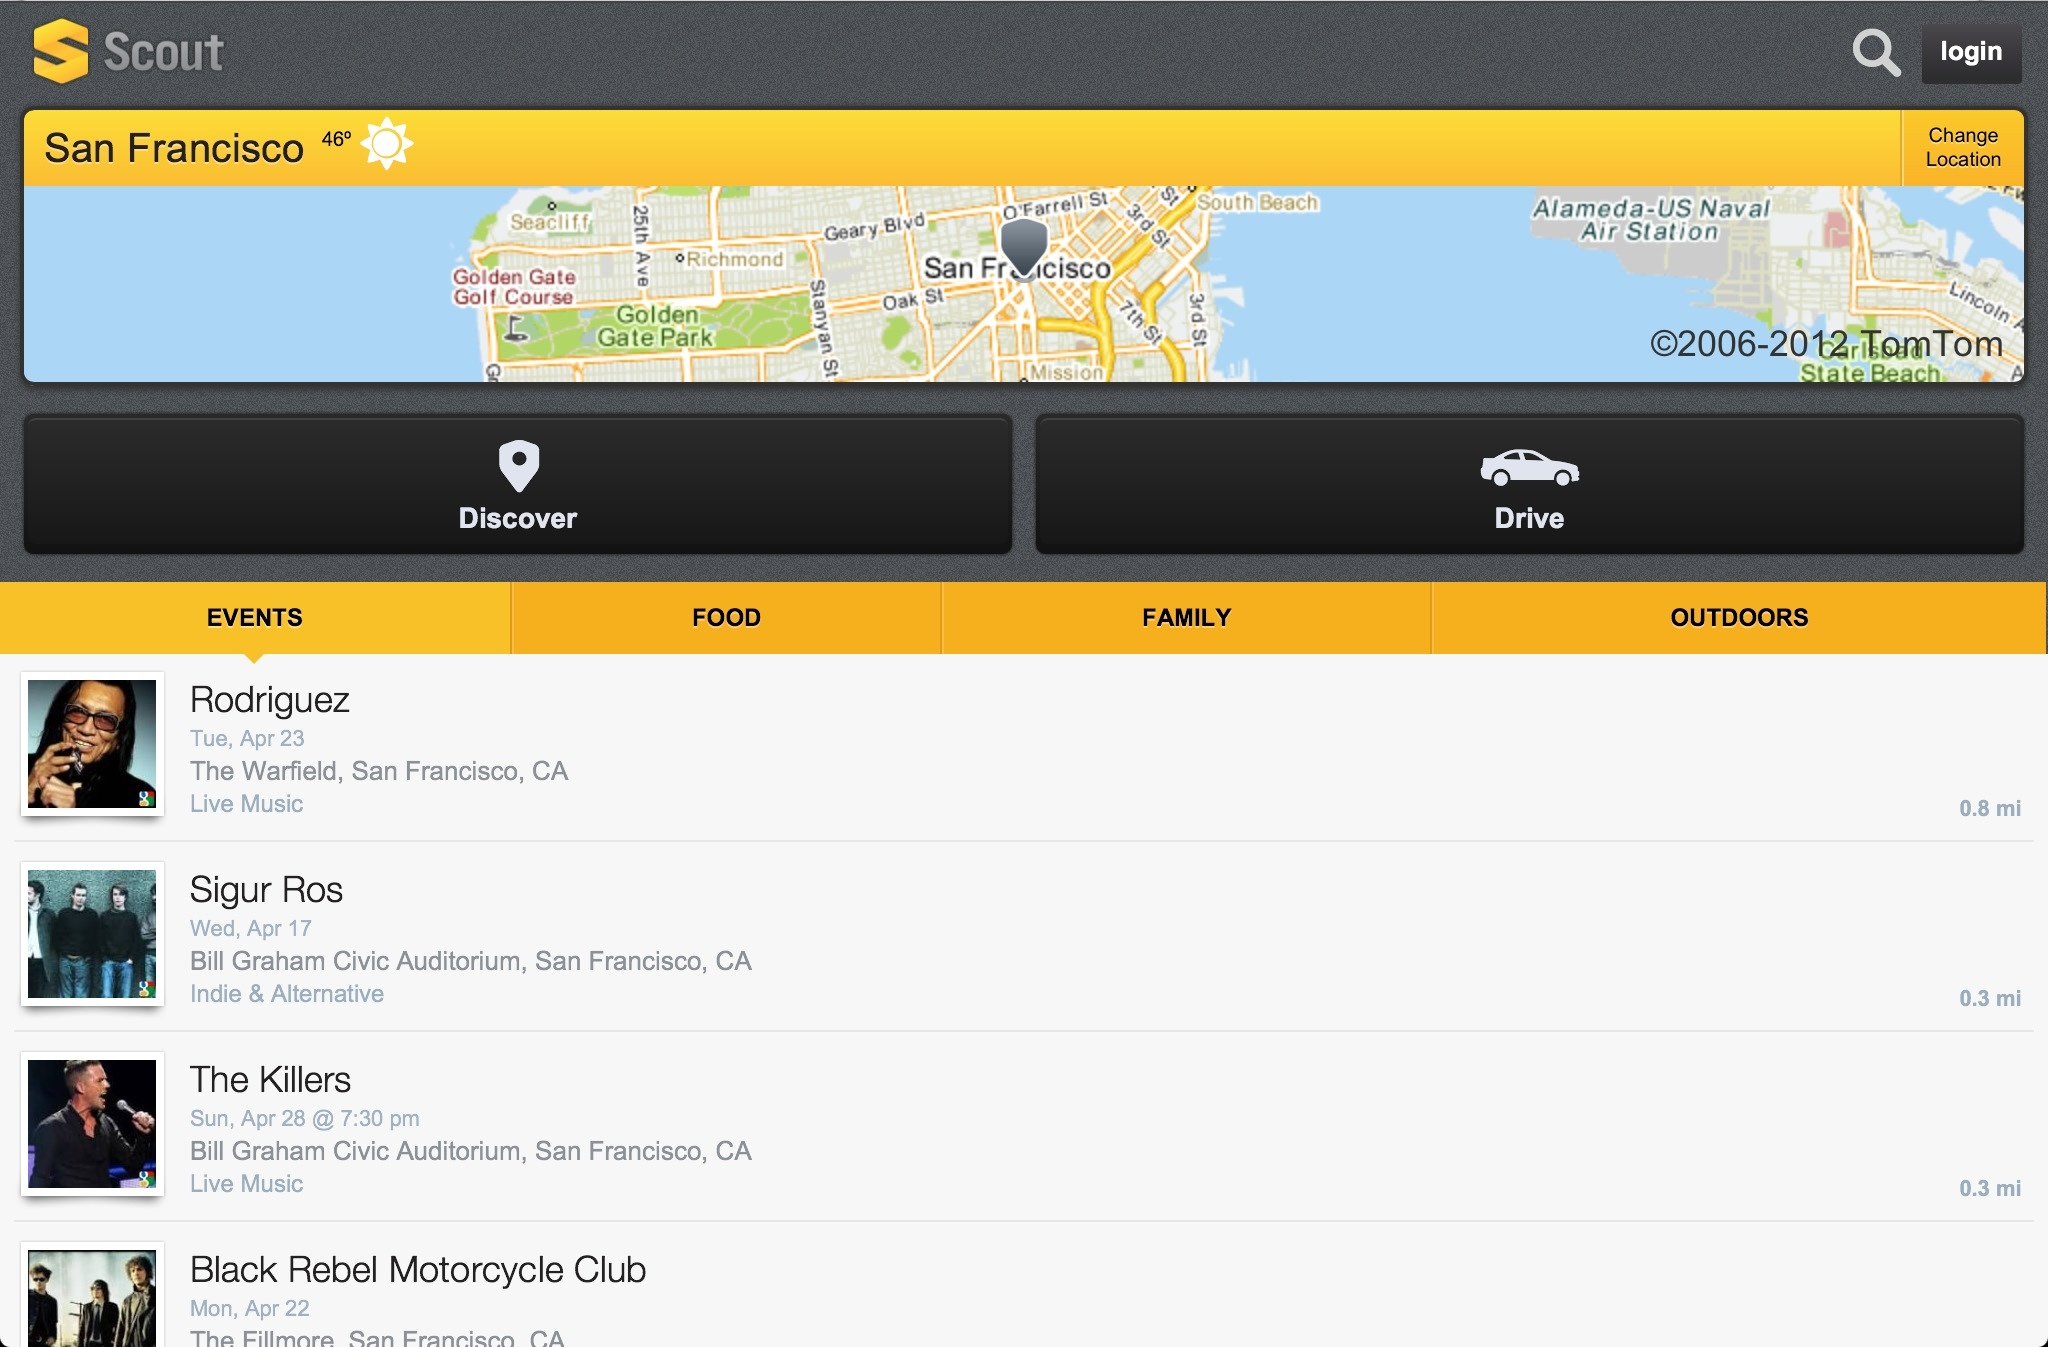 GearDiary Telenav Looks to Shape Ads Based on GPS Data